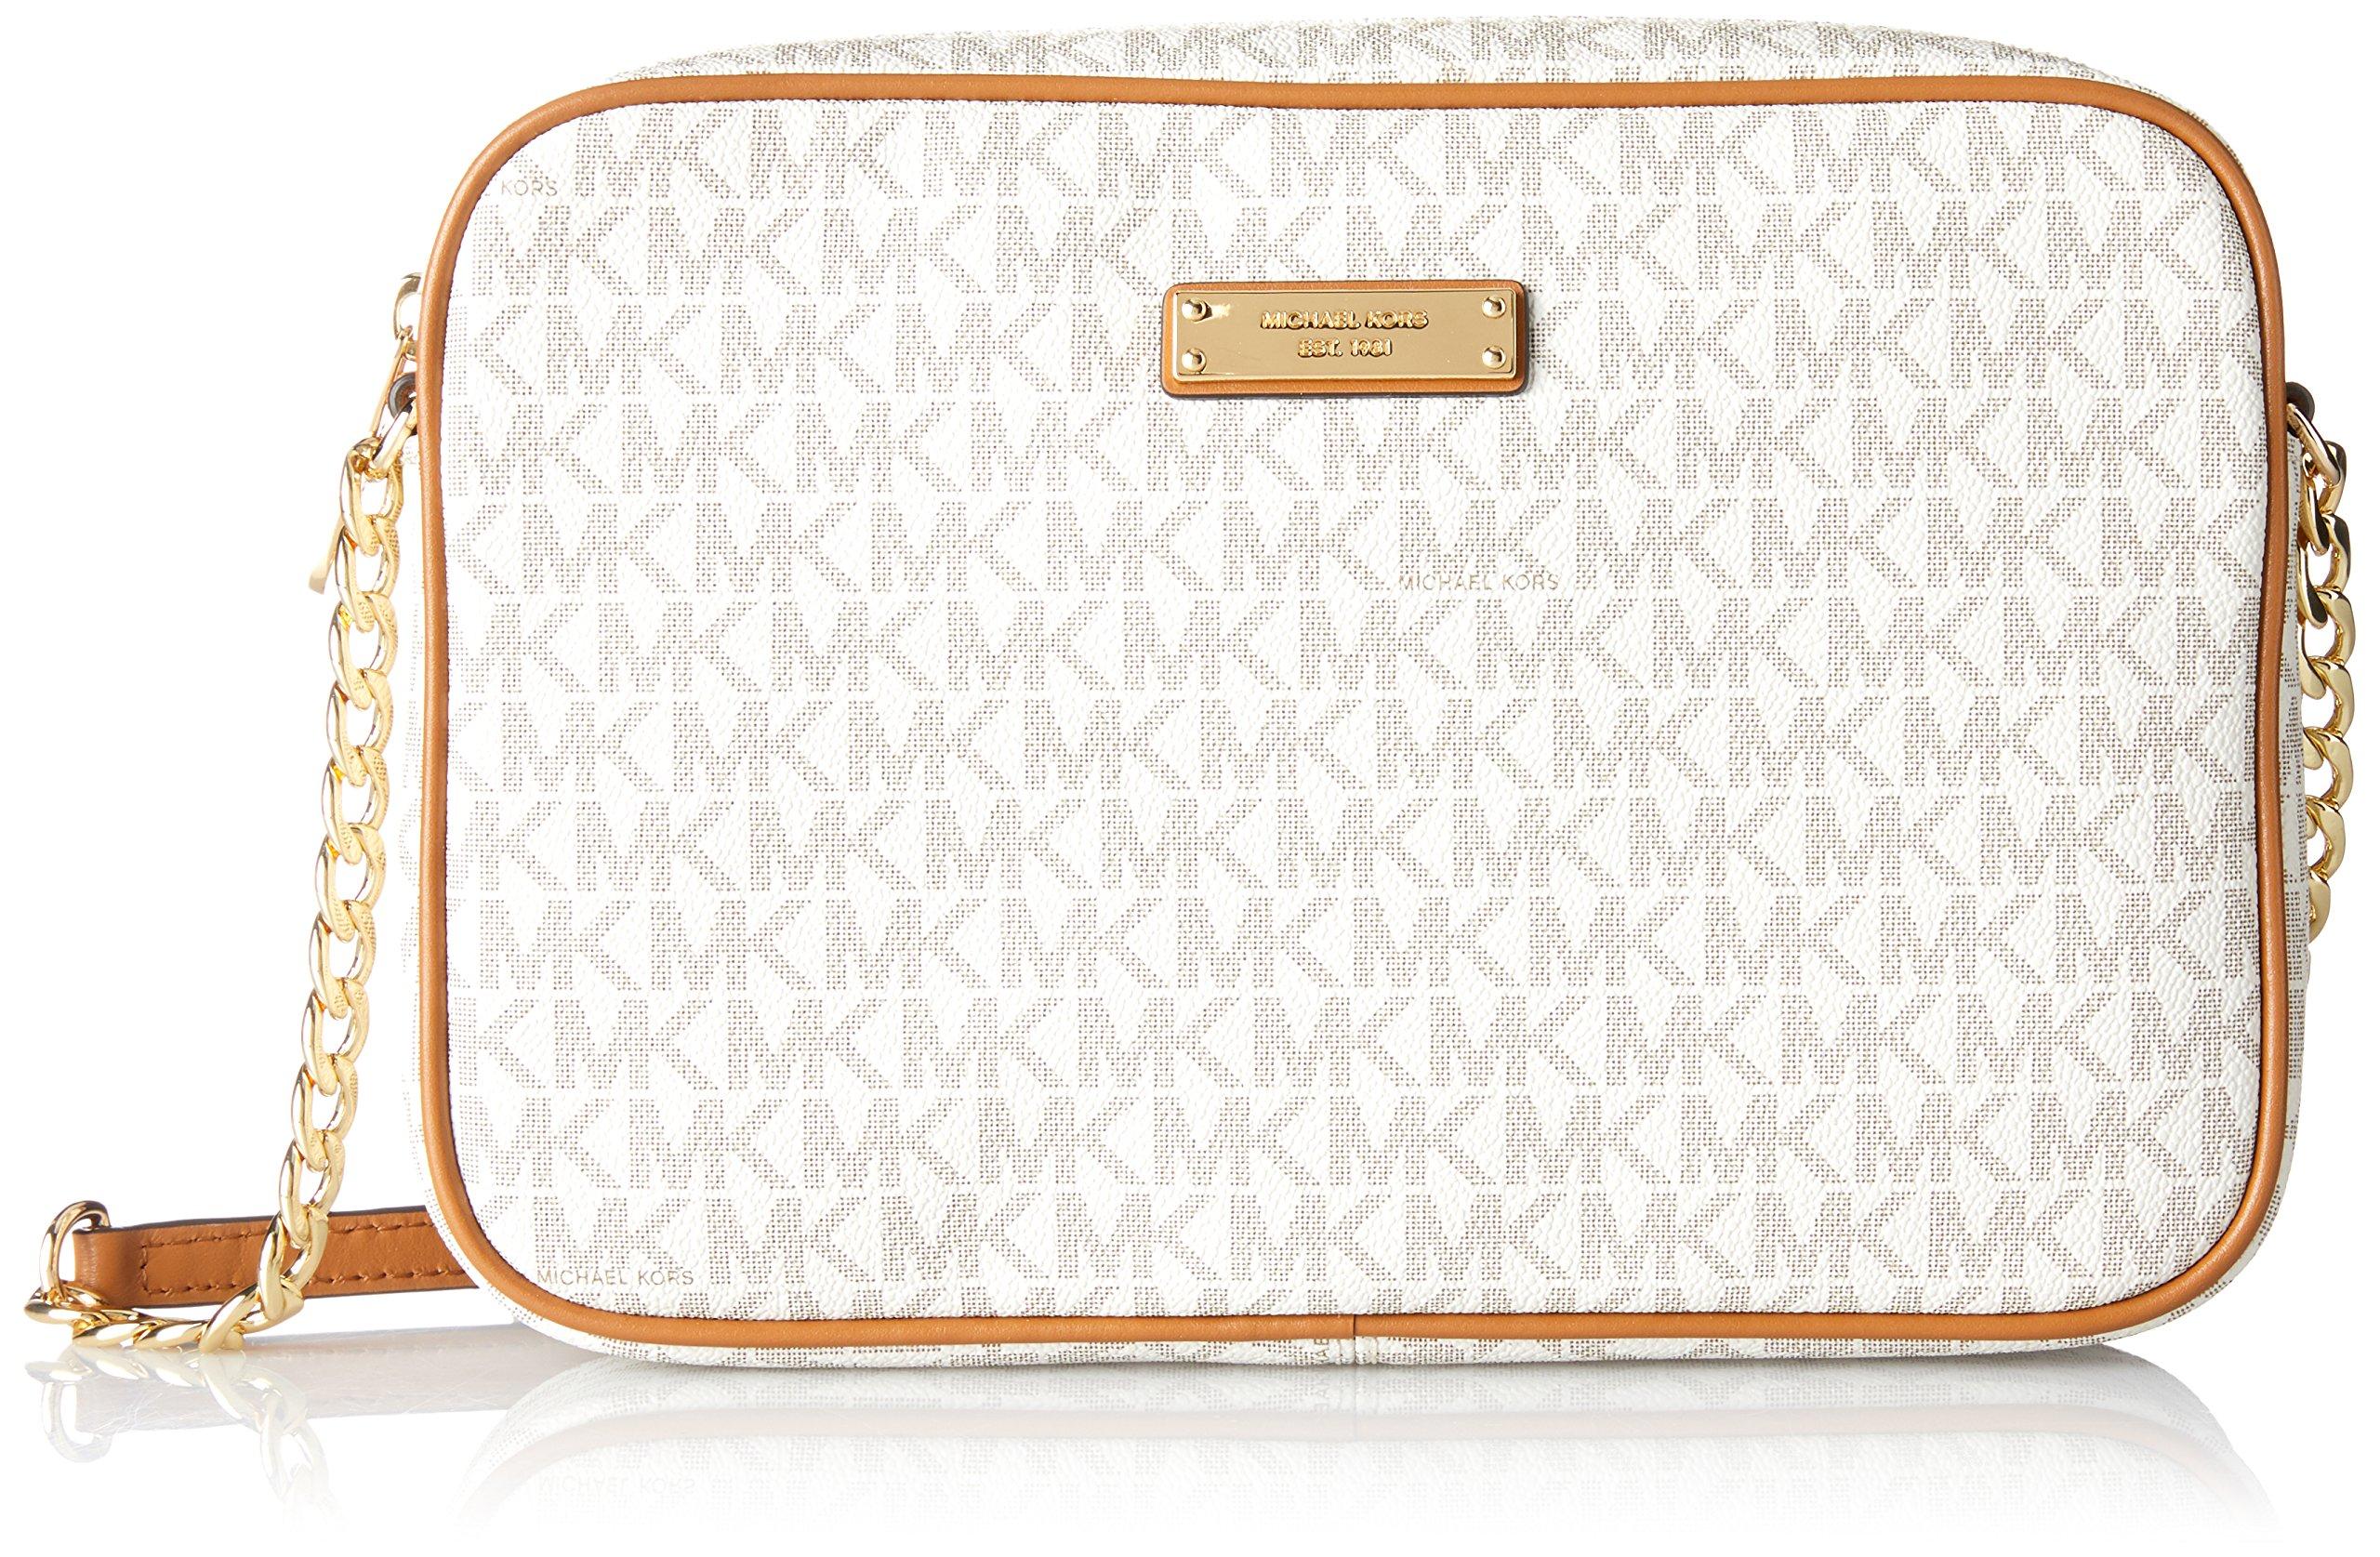 ae58994c2f5f Michael Kors Women Jet Set Large Crossbody Vanilla Handbag Leather Beige  Gold